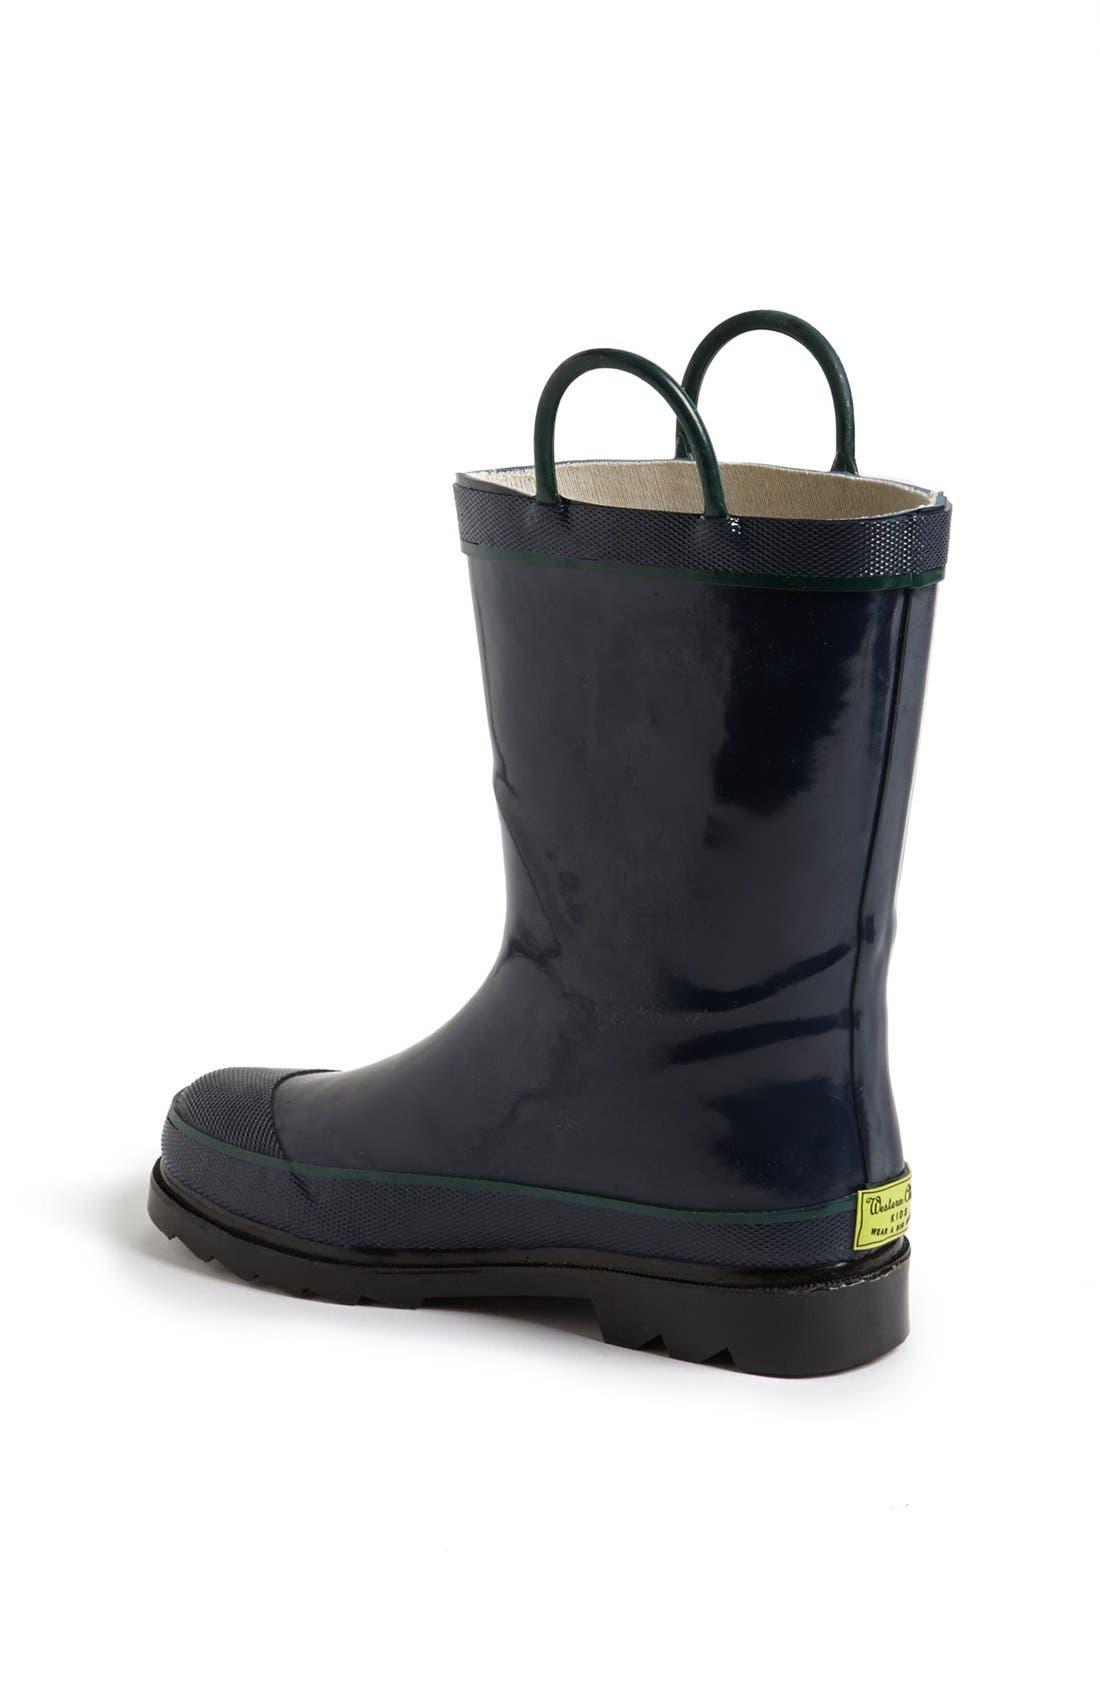 Firechief 2 Waterproof Rain Boot,                             Alternate thumbnail 3, color,                             NAVY